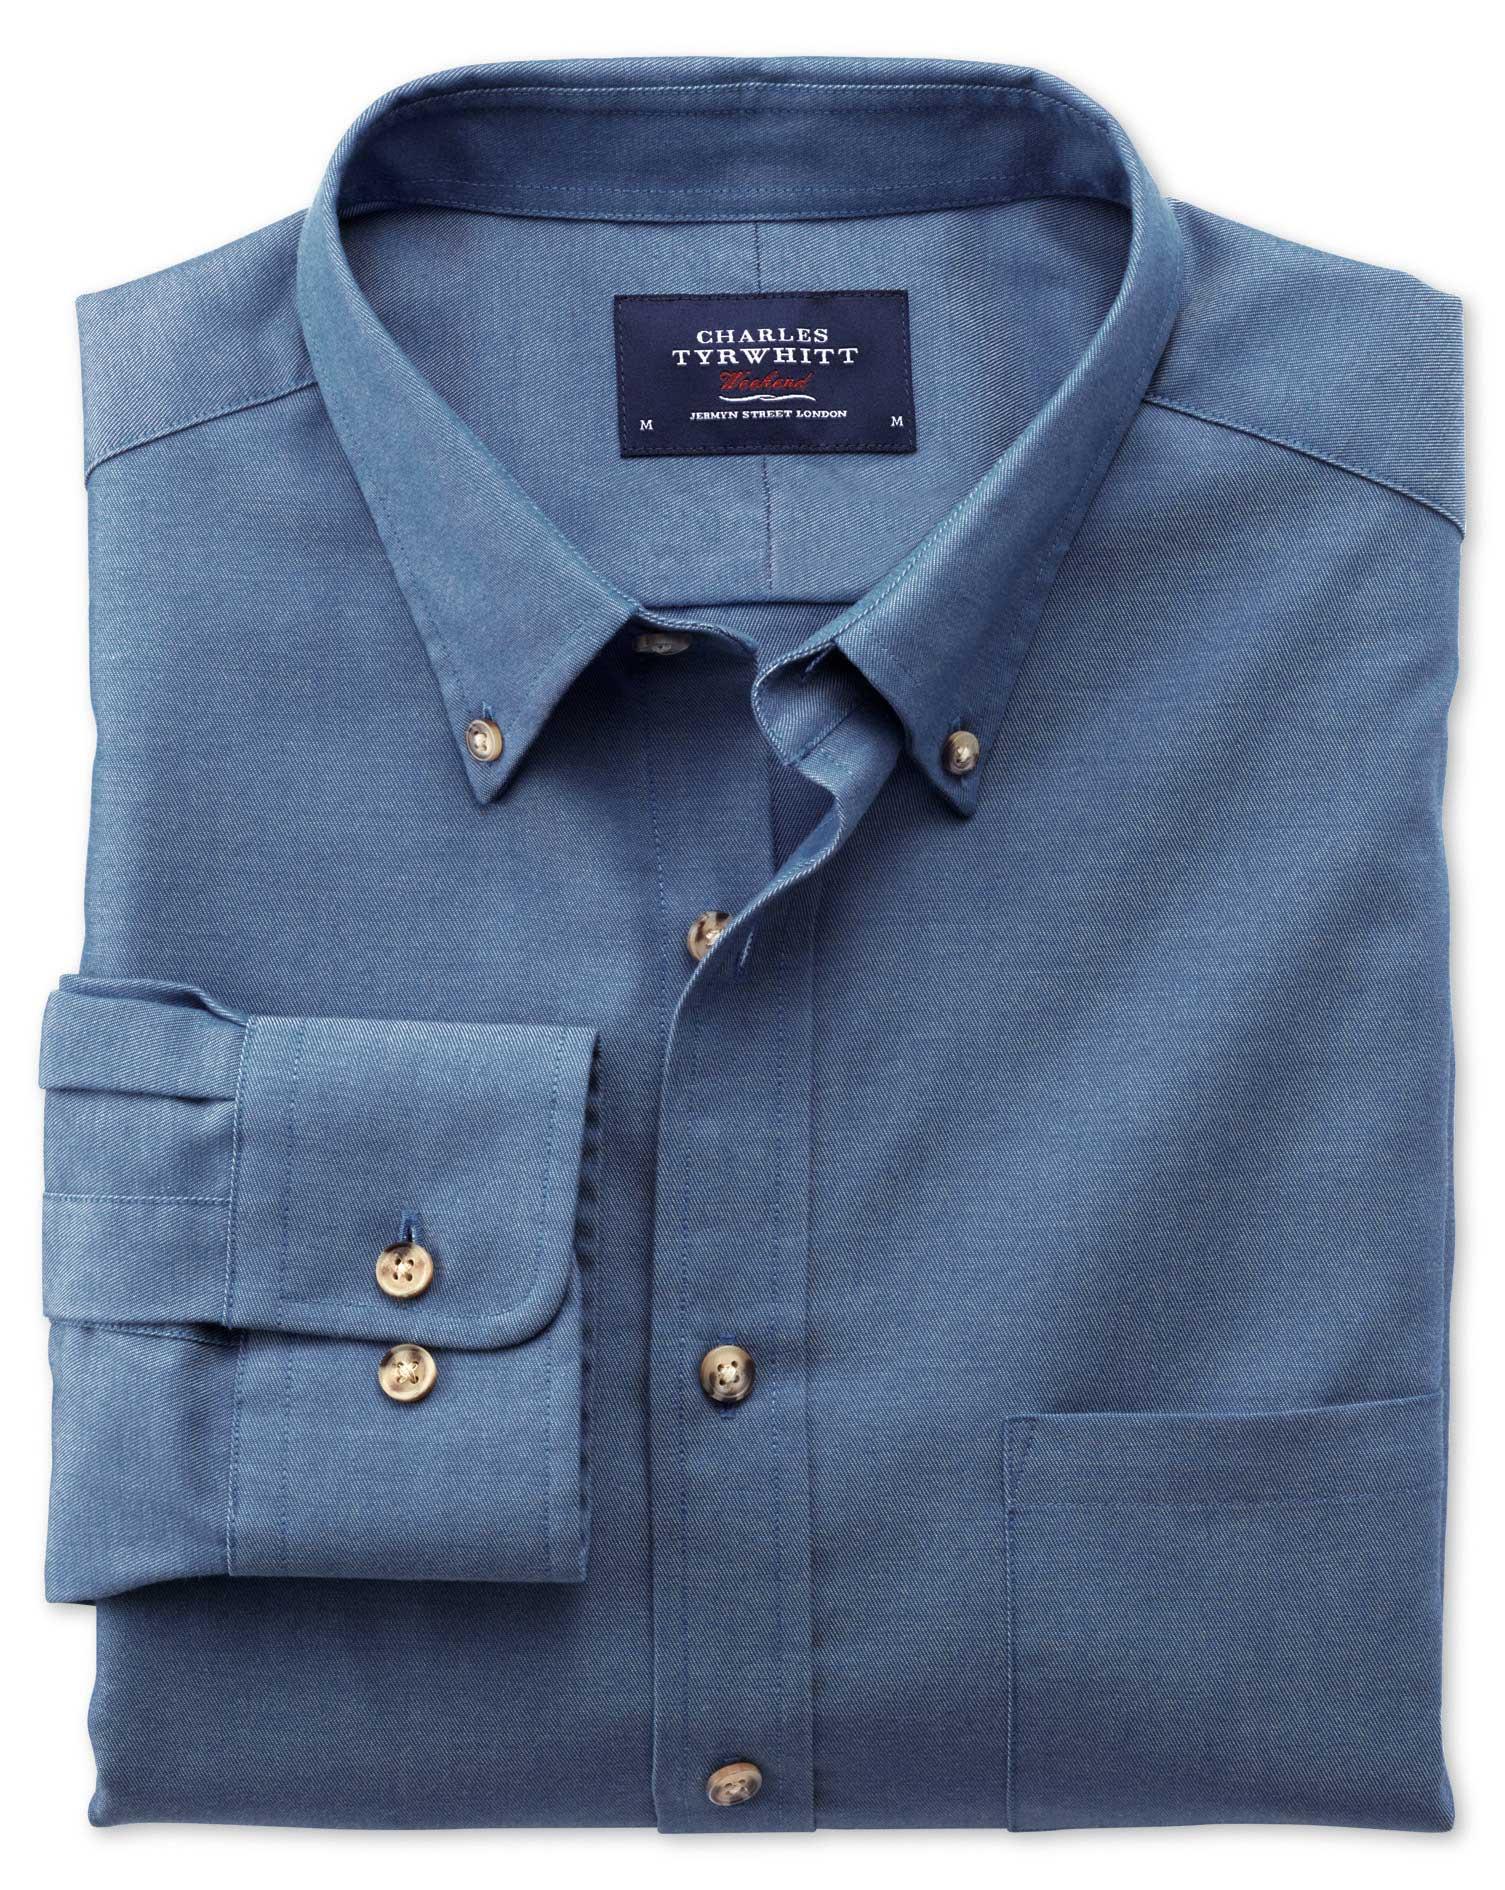 Extra Slim Fit Non-Iron Twill Blue Cotton Shirt Single Cuff Size XXL by Charles Tyrwhitt